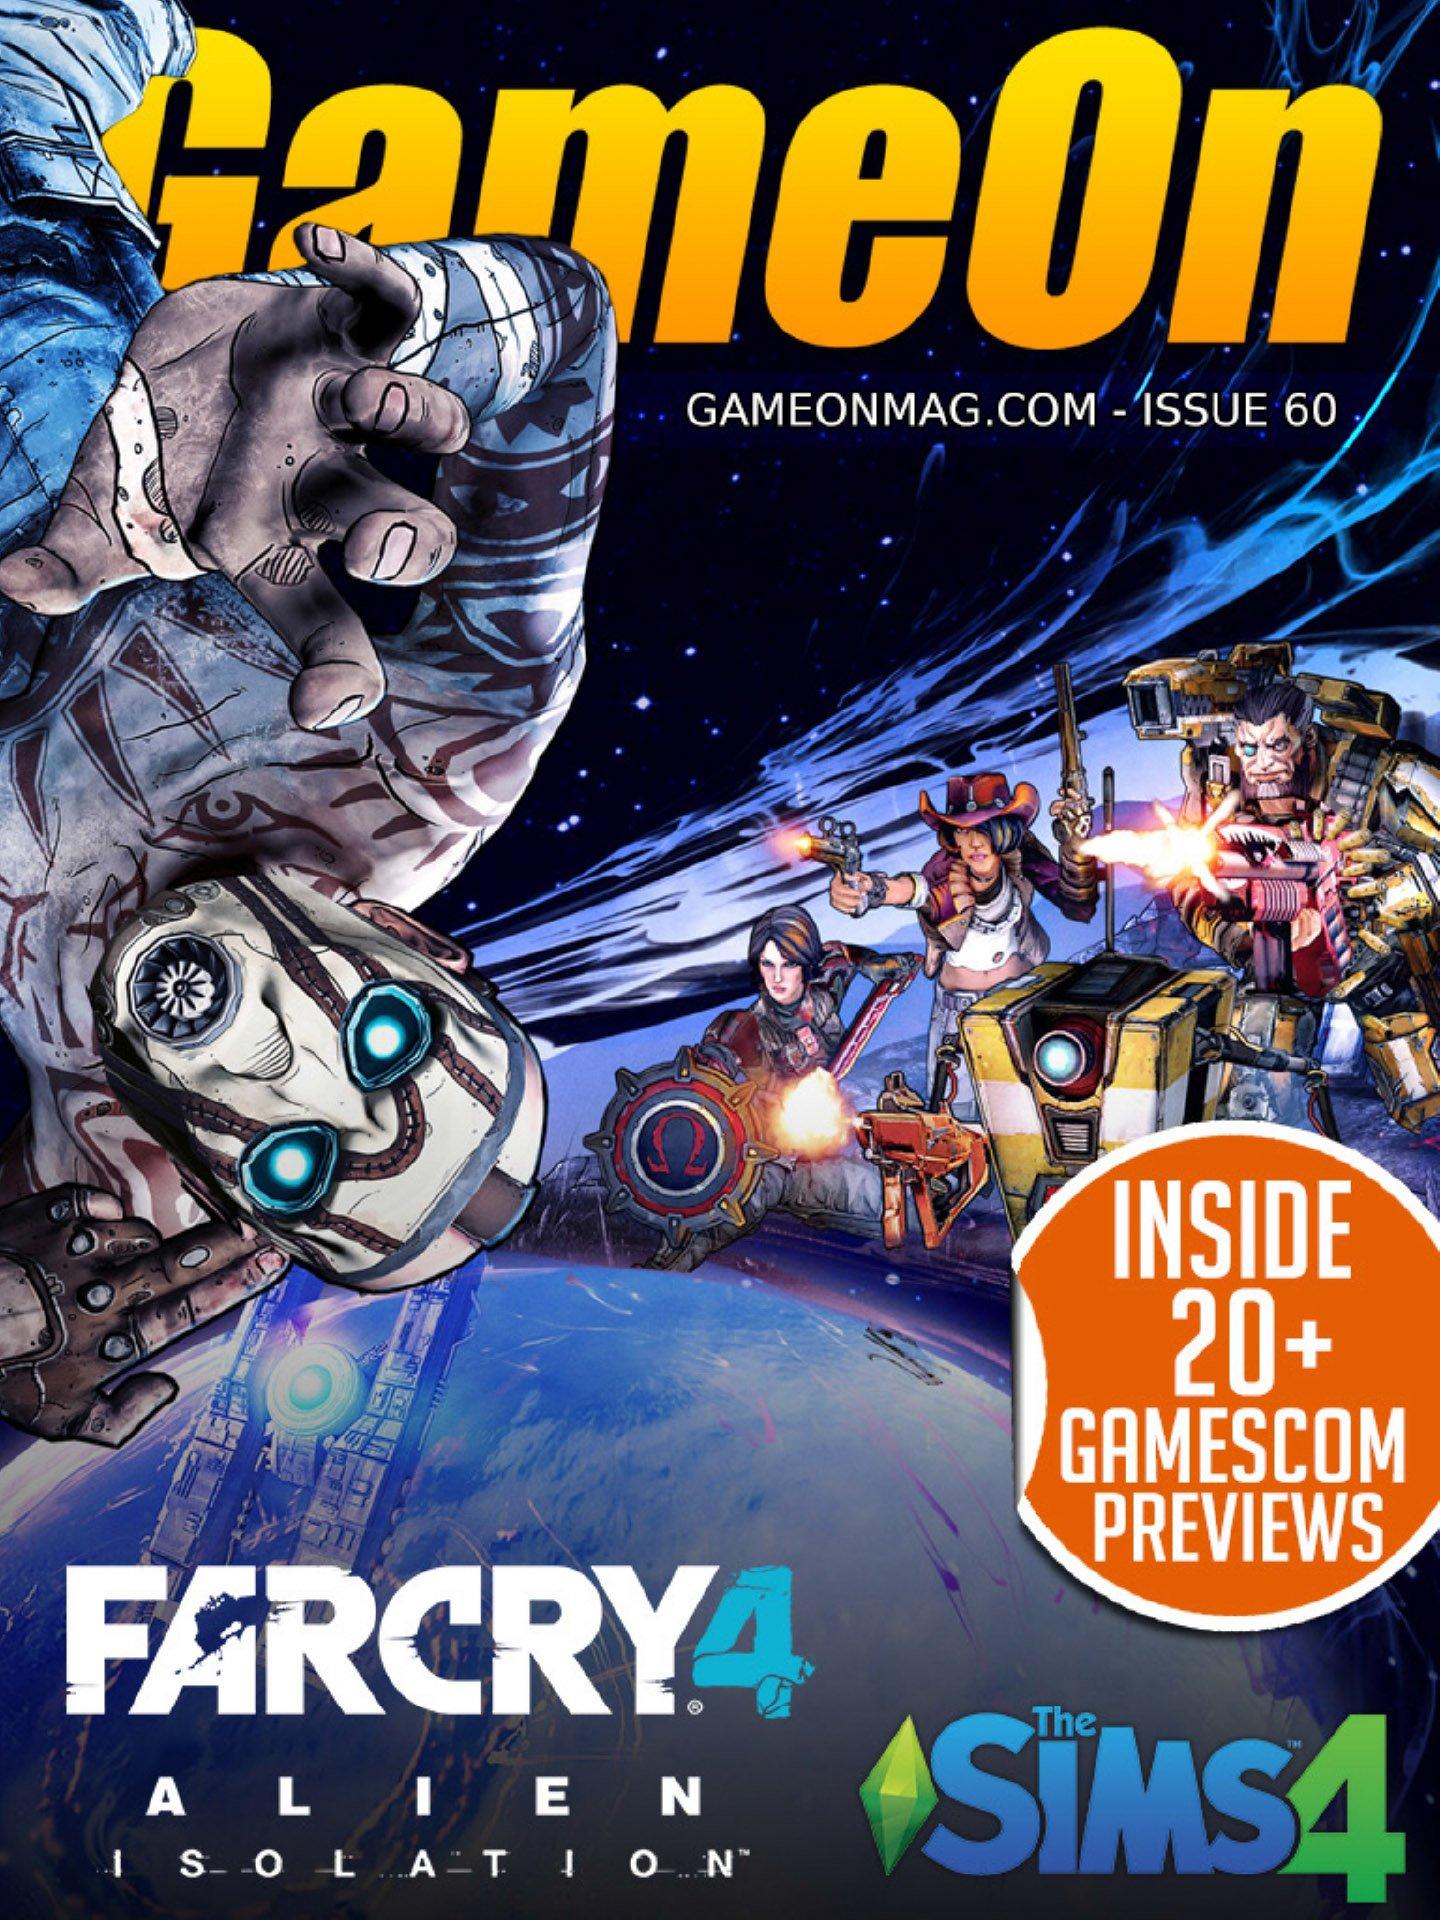 GameOn 060 (October 2014)